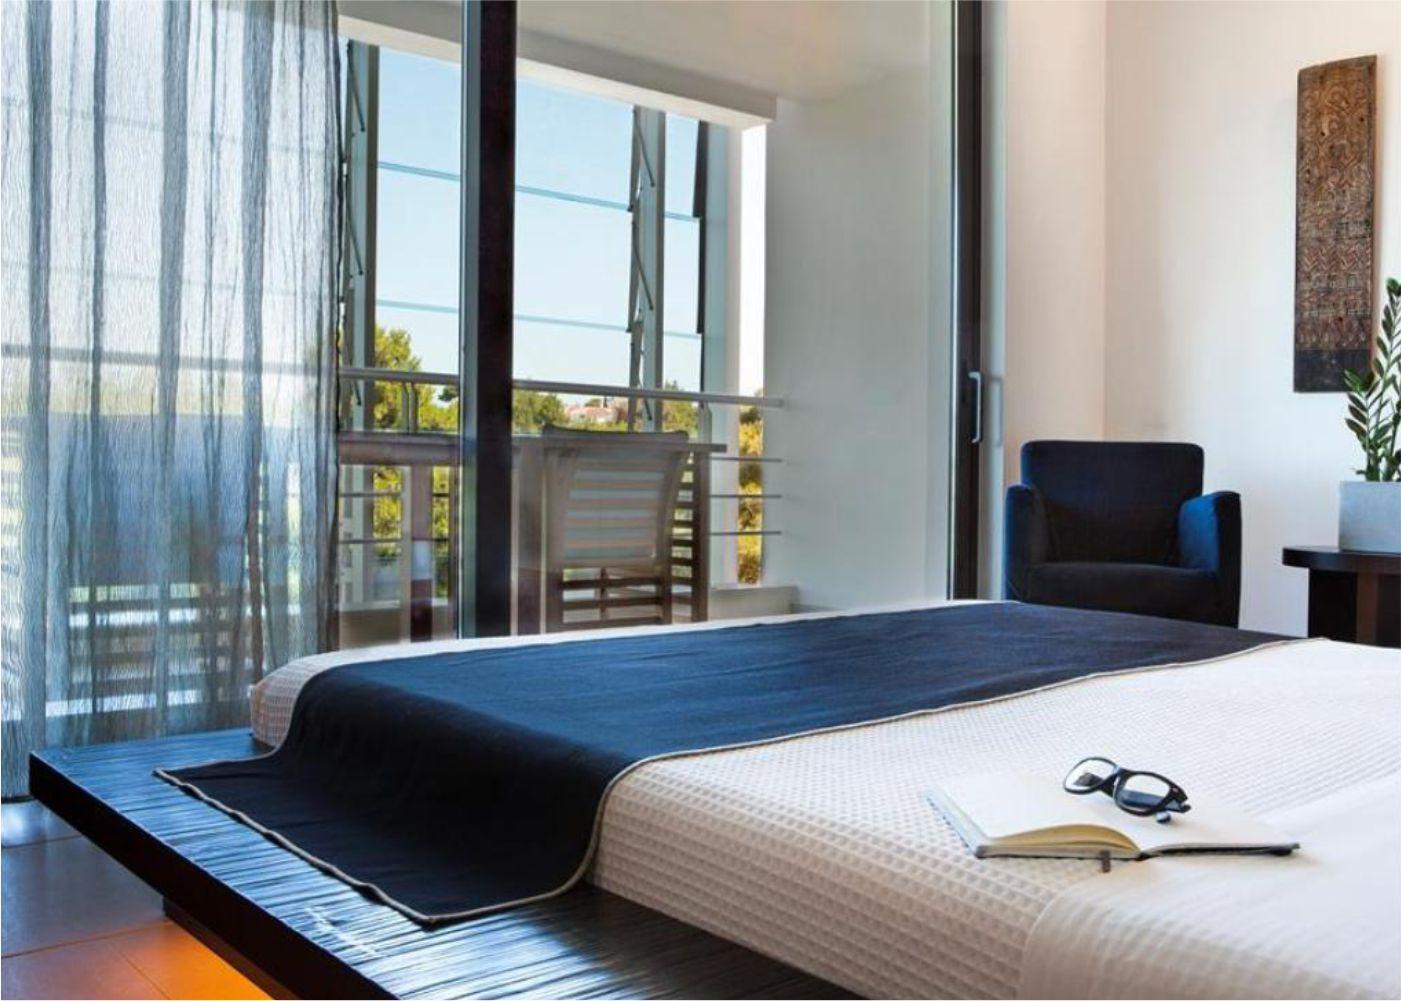 paraskevi-interior-life-gallery-hotel-7